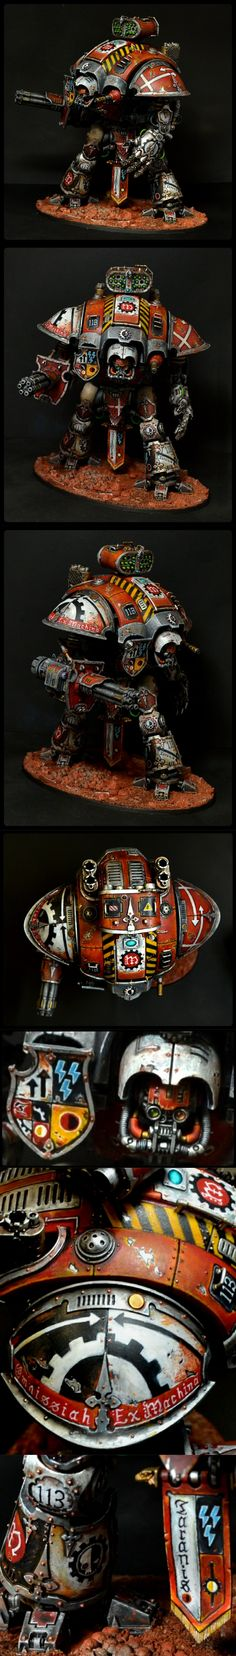 House Taranis Imperial Knight